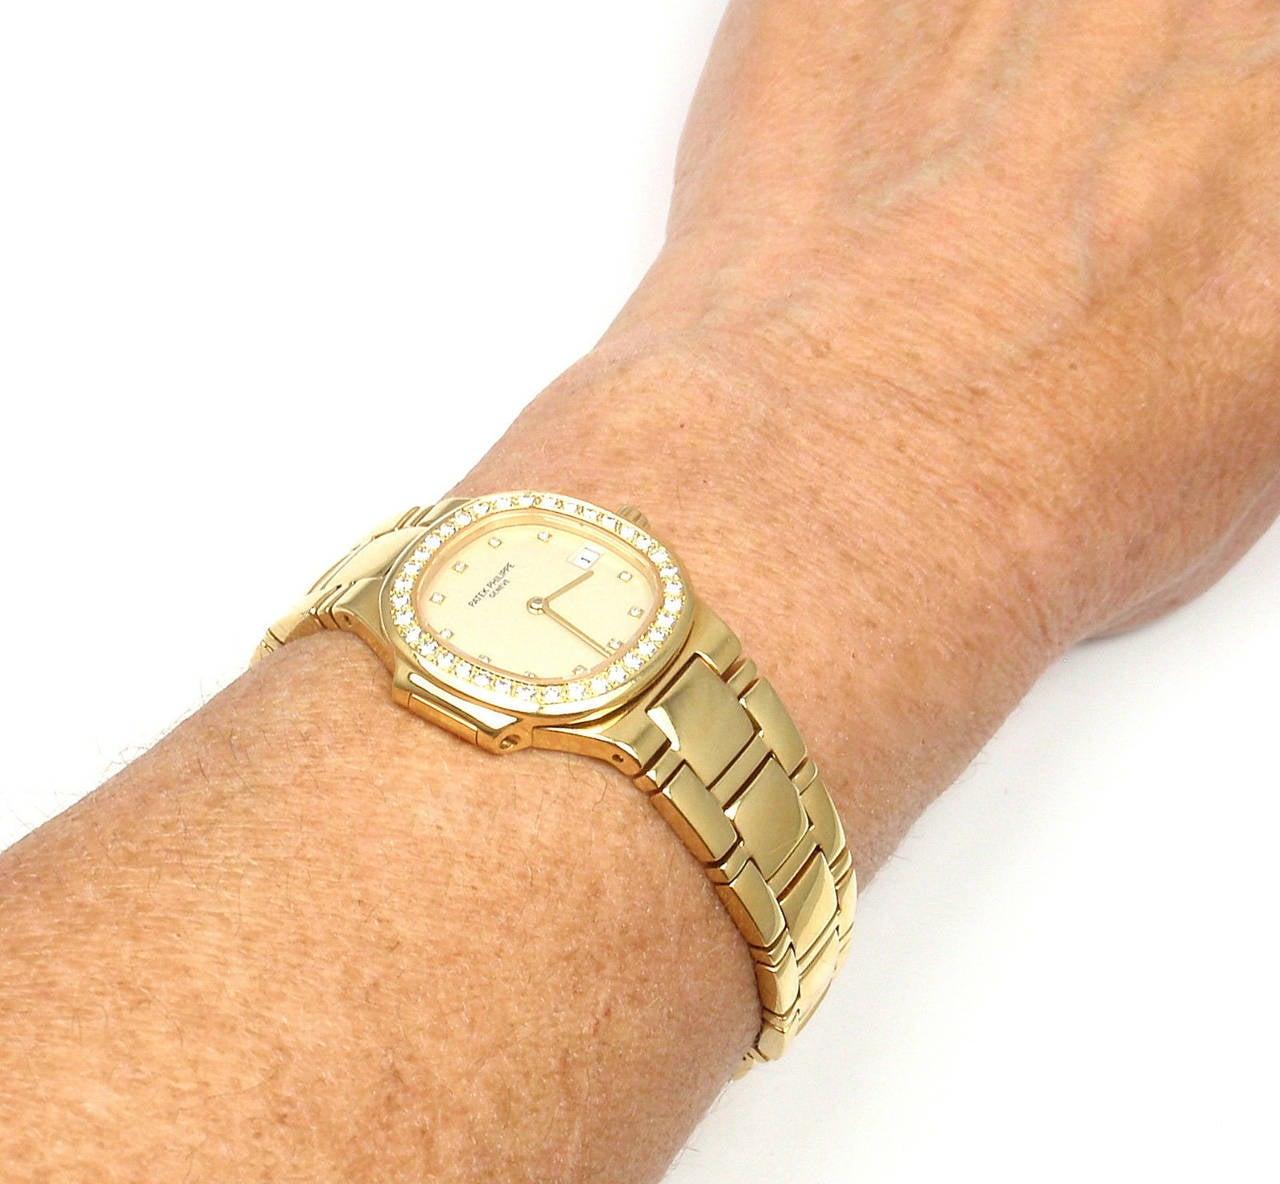 patek philippe calatrava white gold bracelet